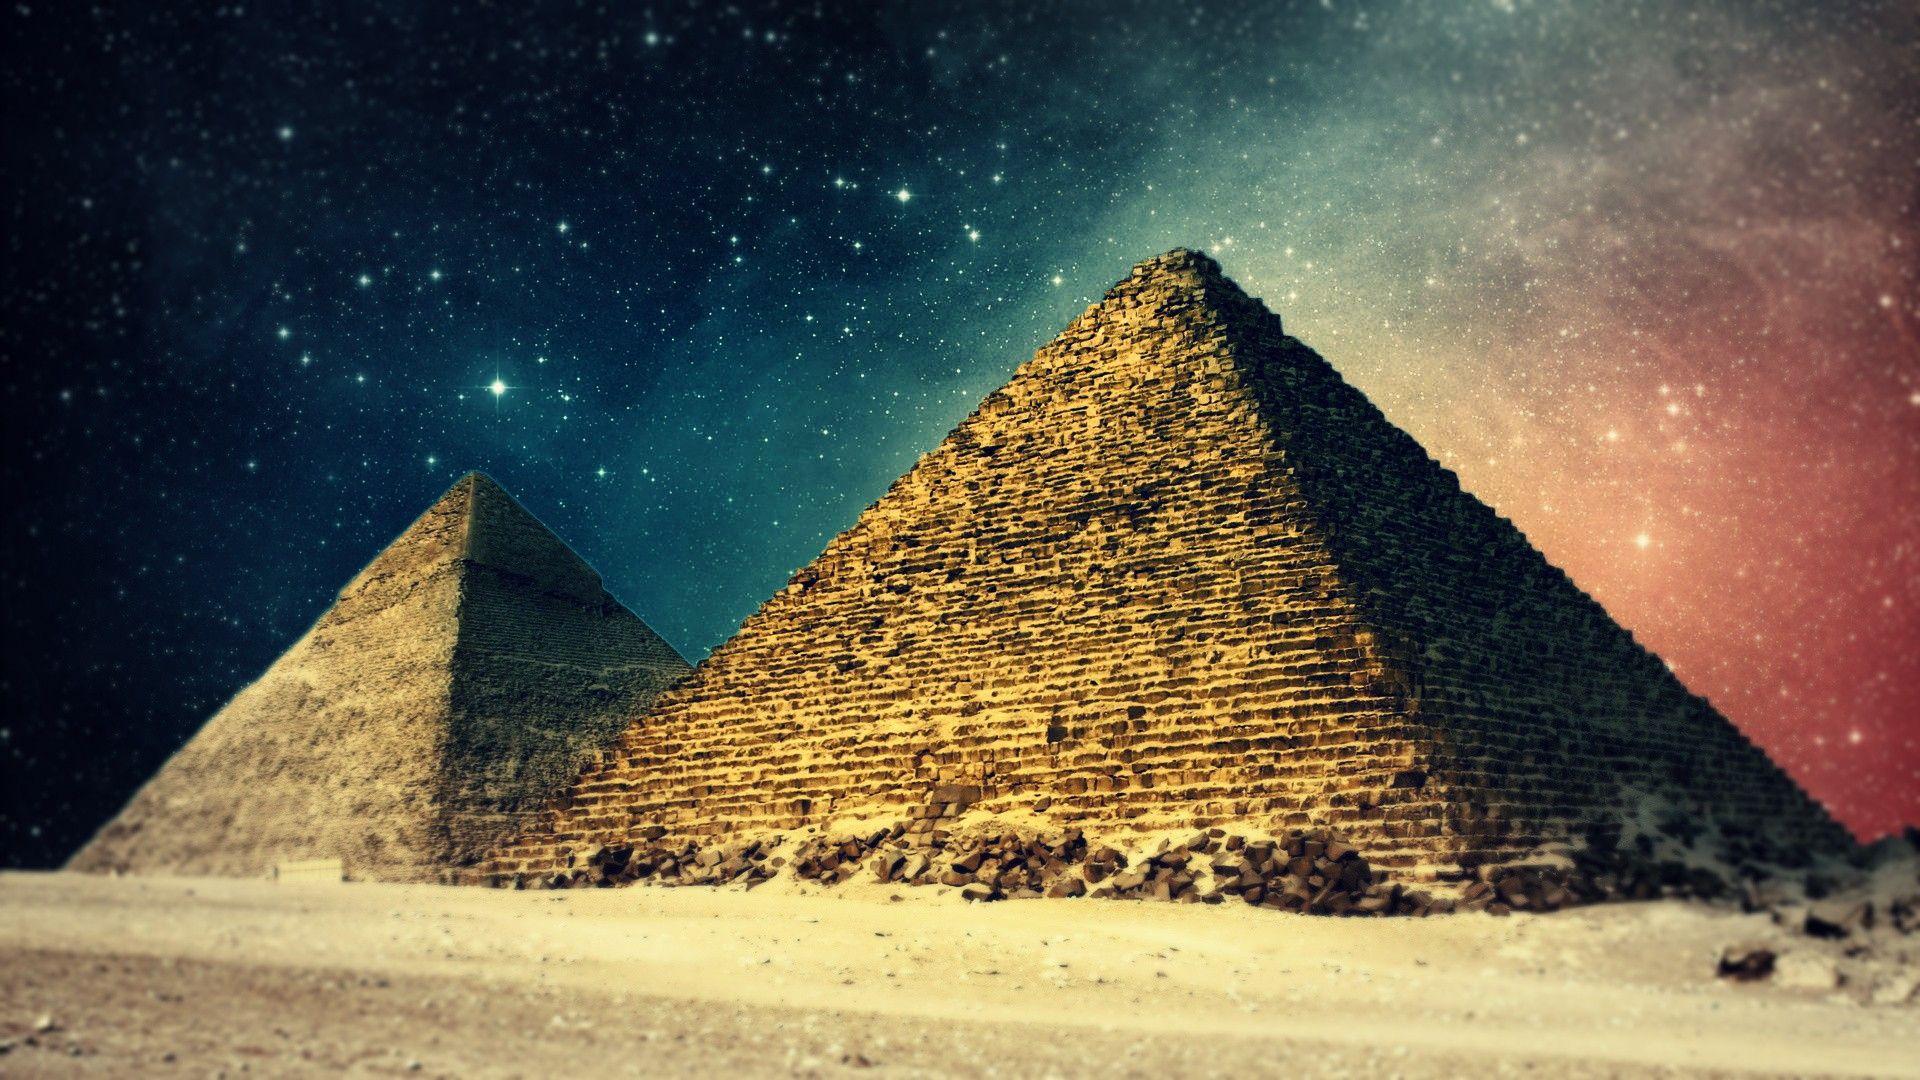 Man Made Pyramid Wallpaper Egypt Wallpaper Pyramids Pyramids Egypt